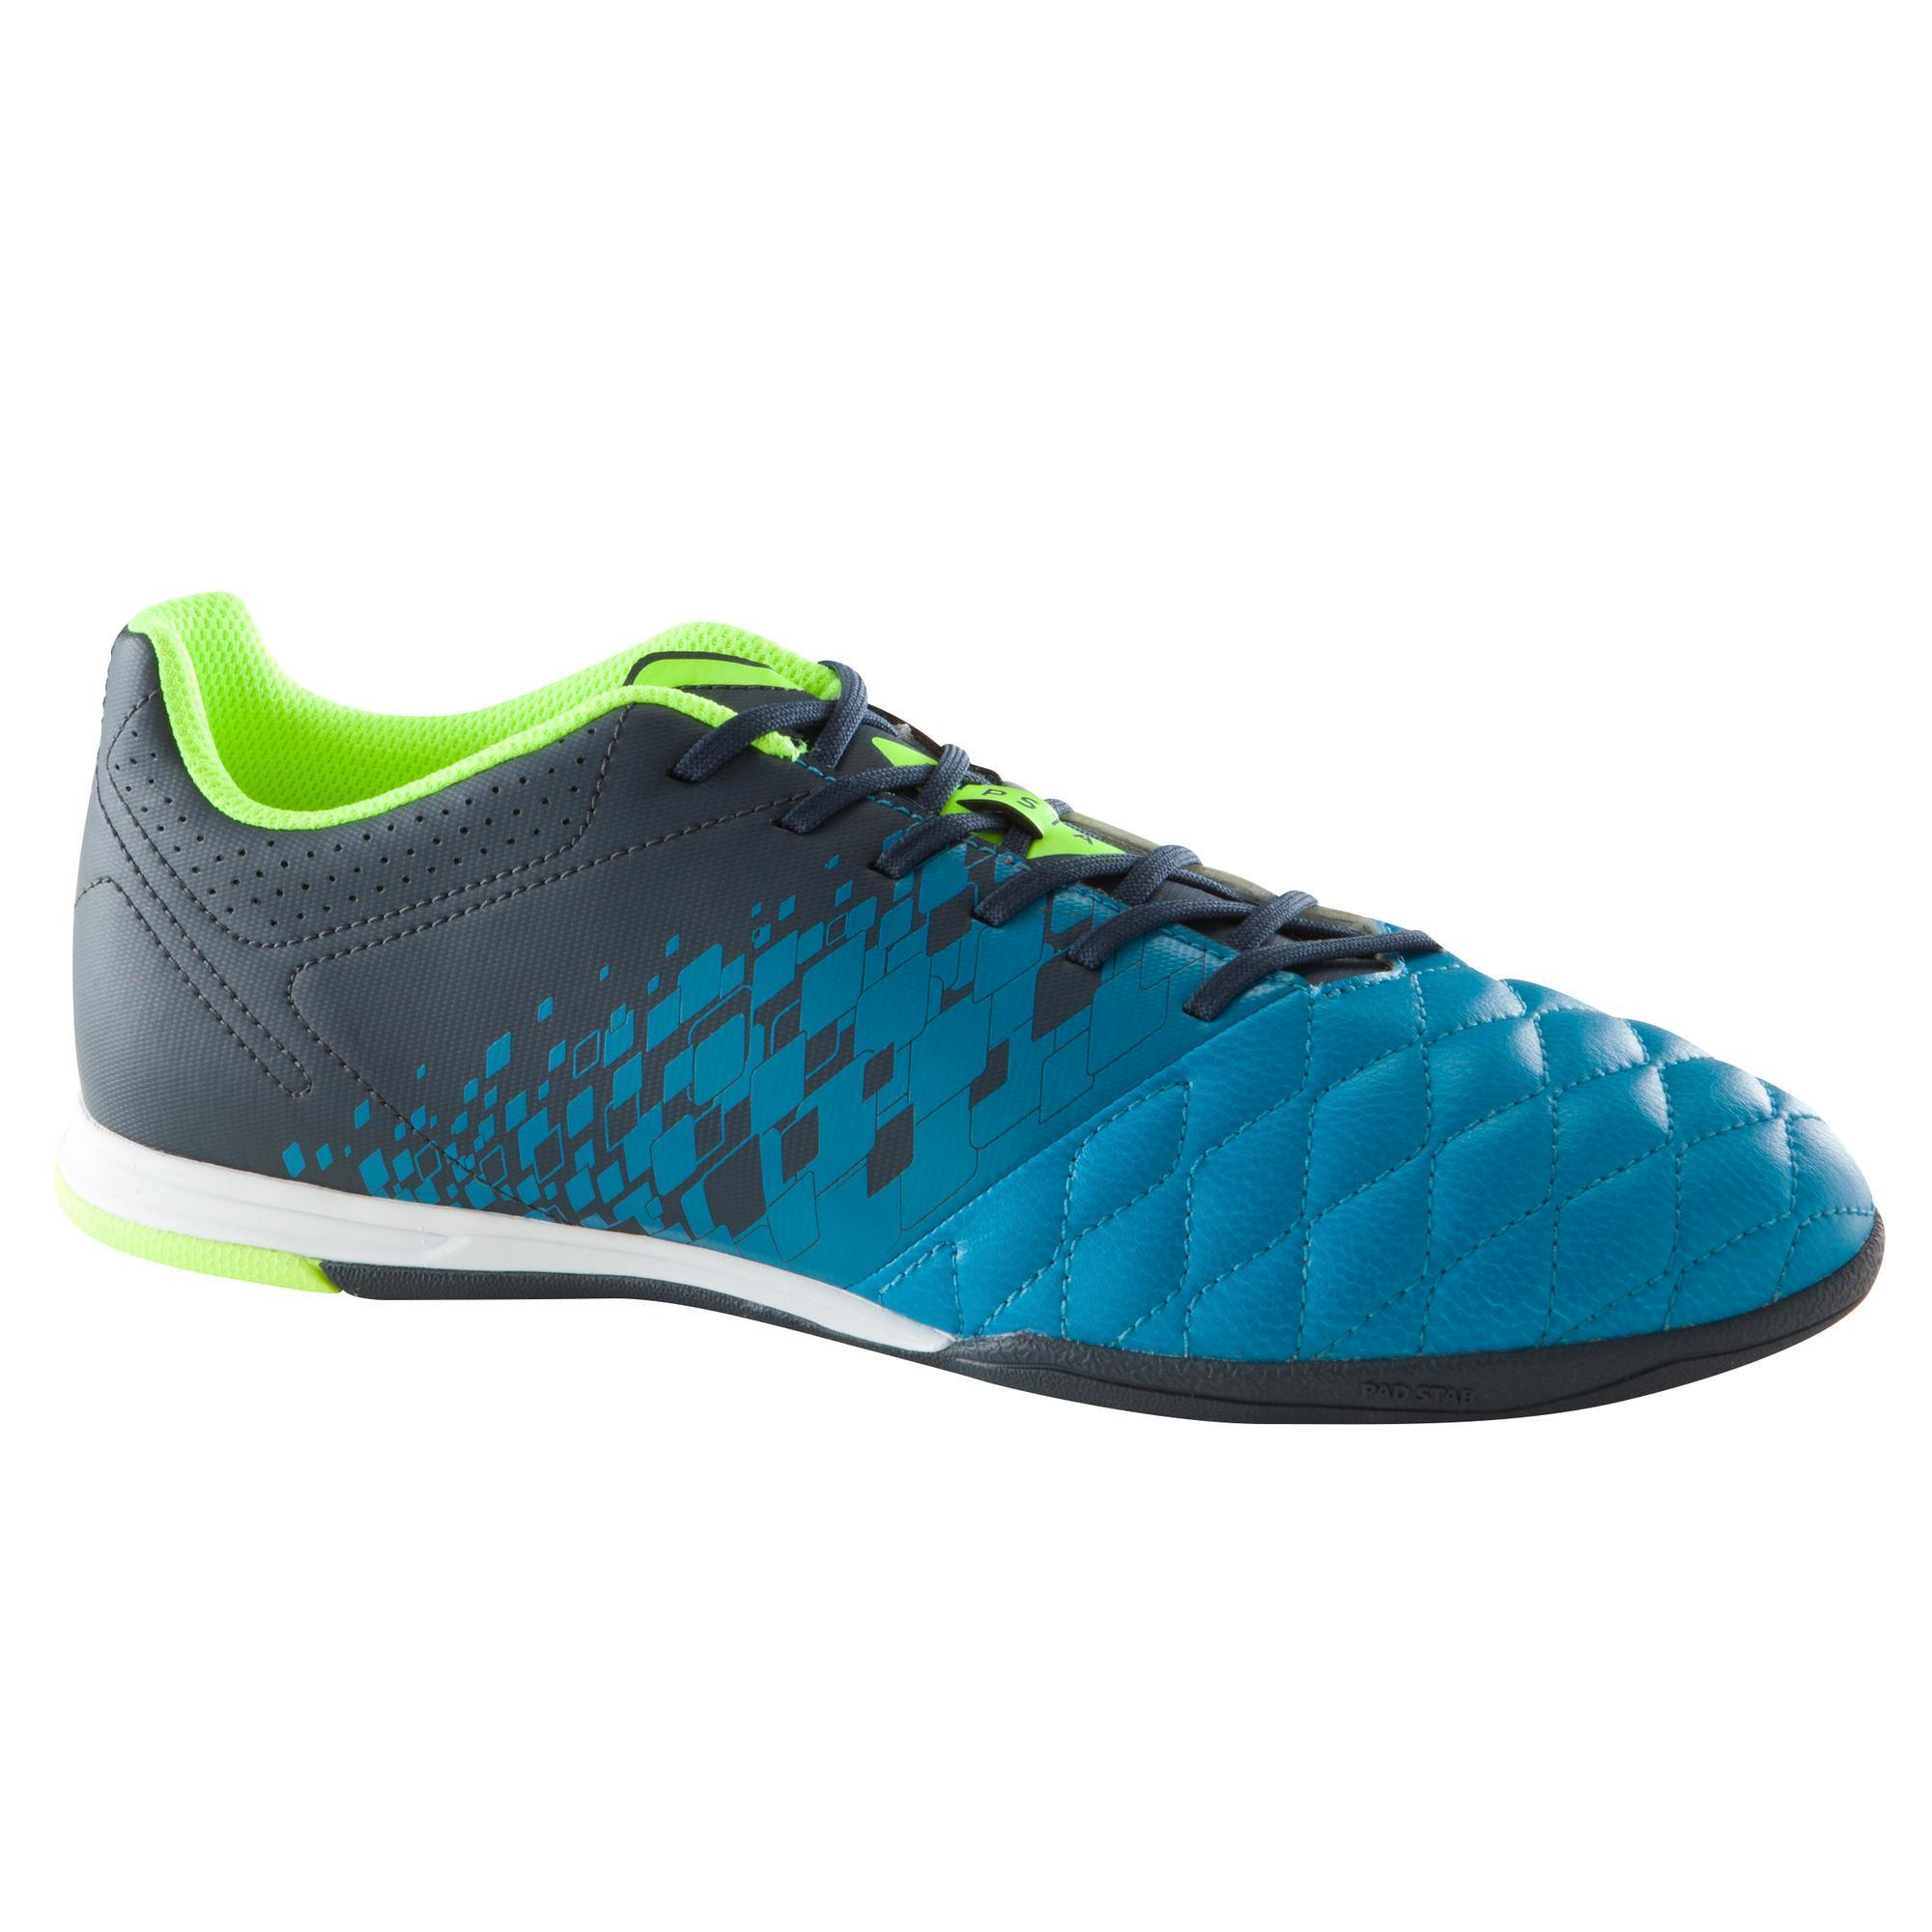 Hallenschuhe Futsal Fußball Agility 500 Erwachsene blau | Schuhe > Sportschuhe > Hallenschuhe | Imviso